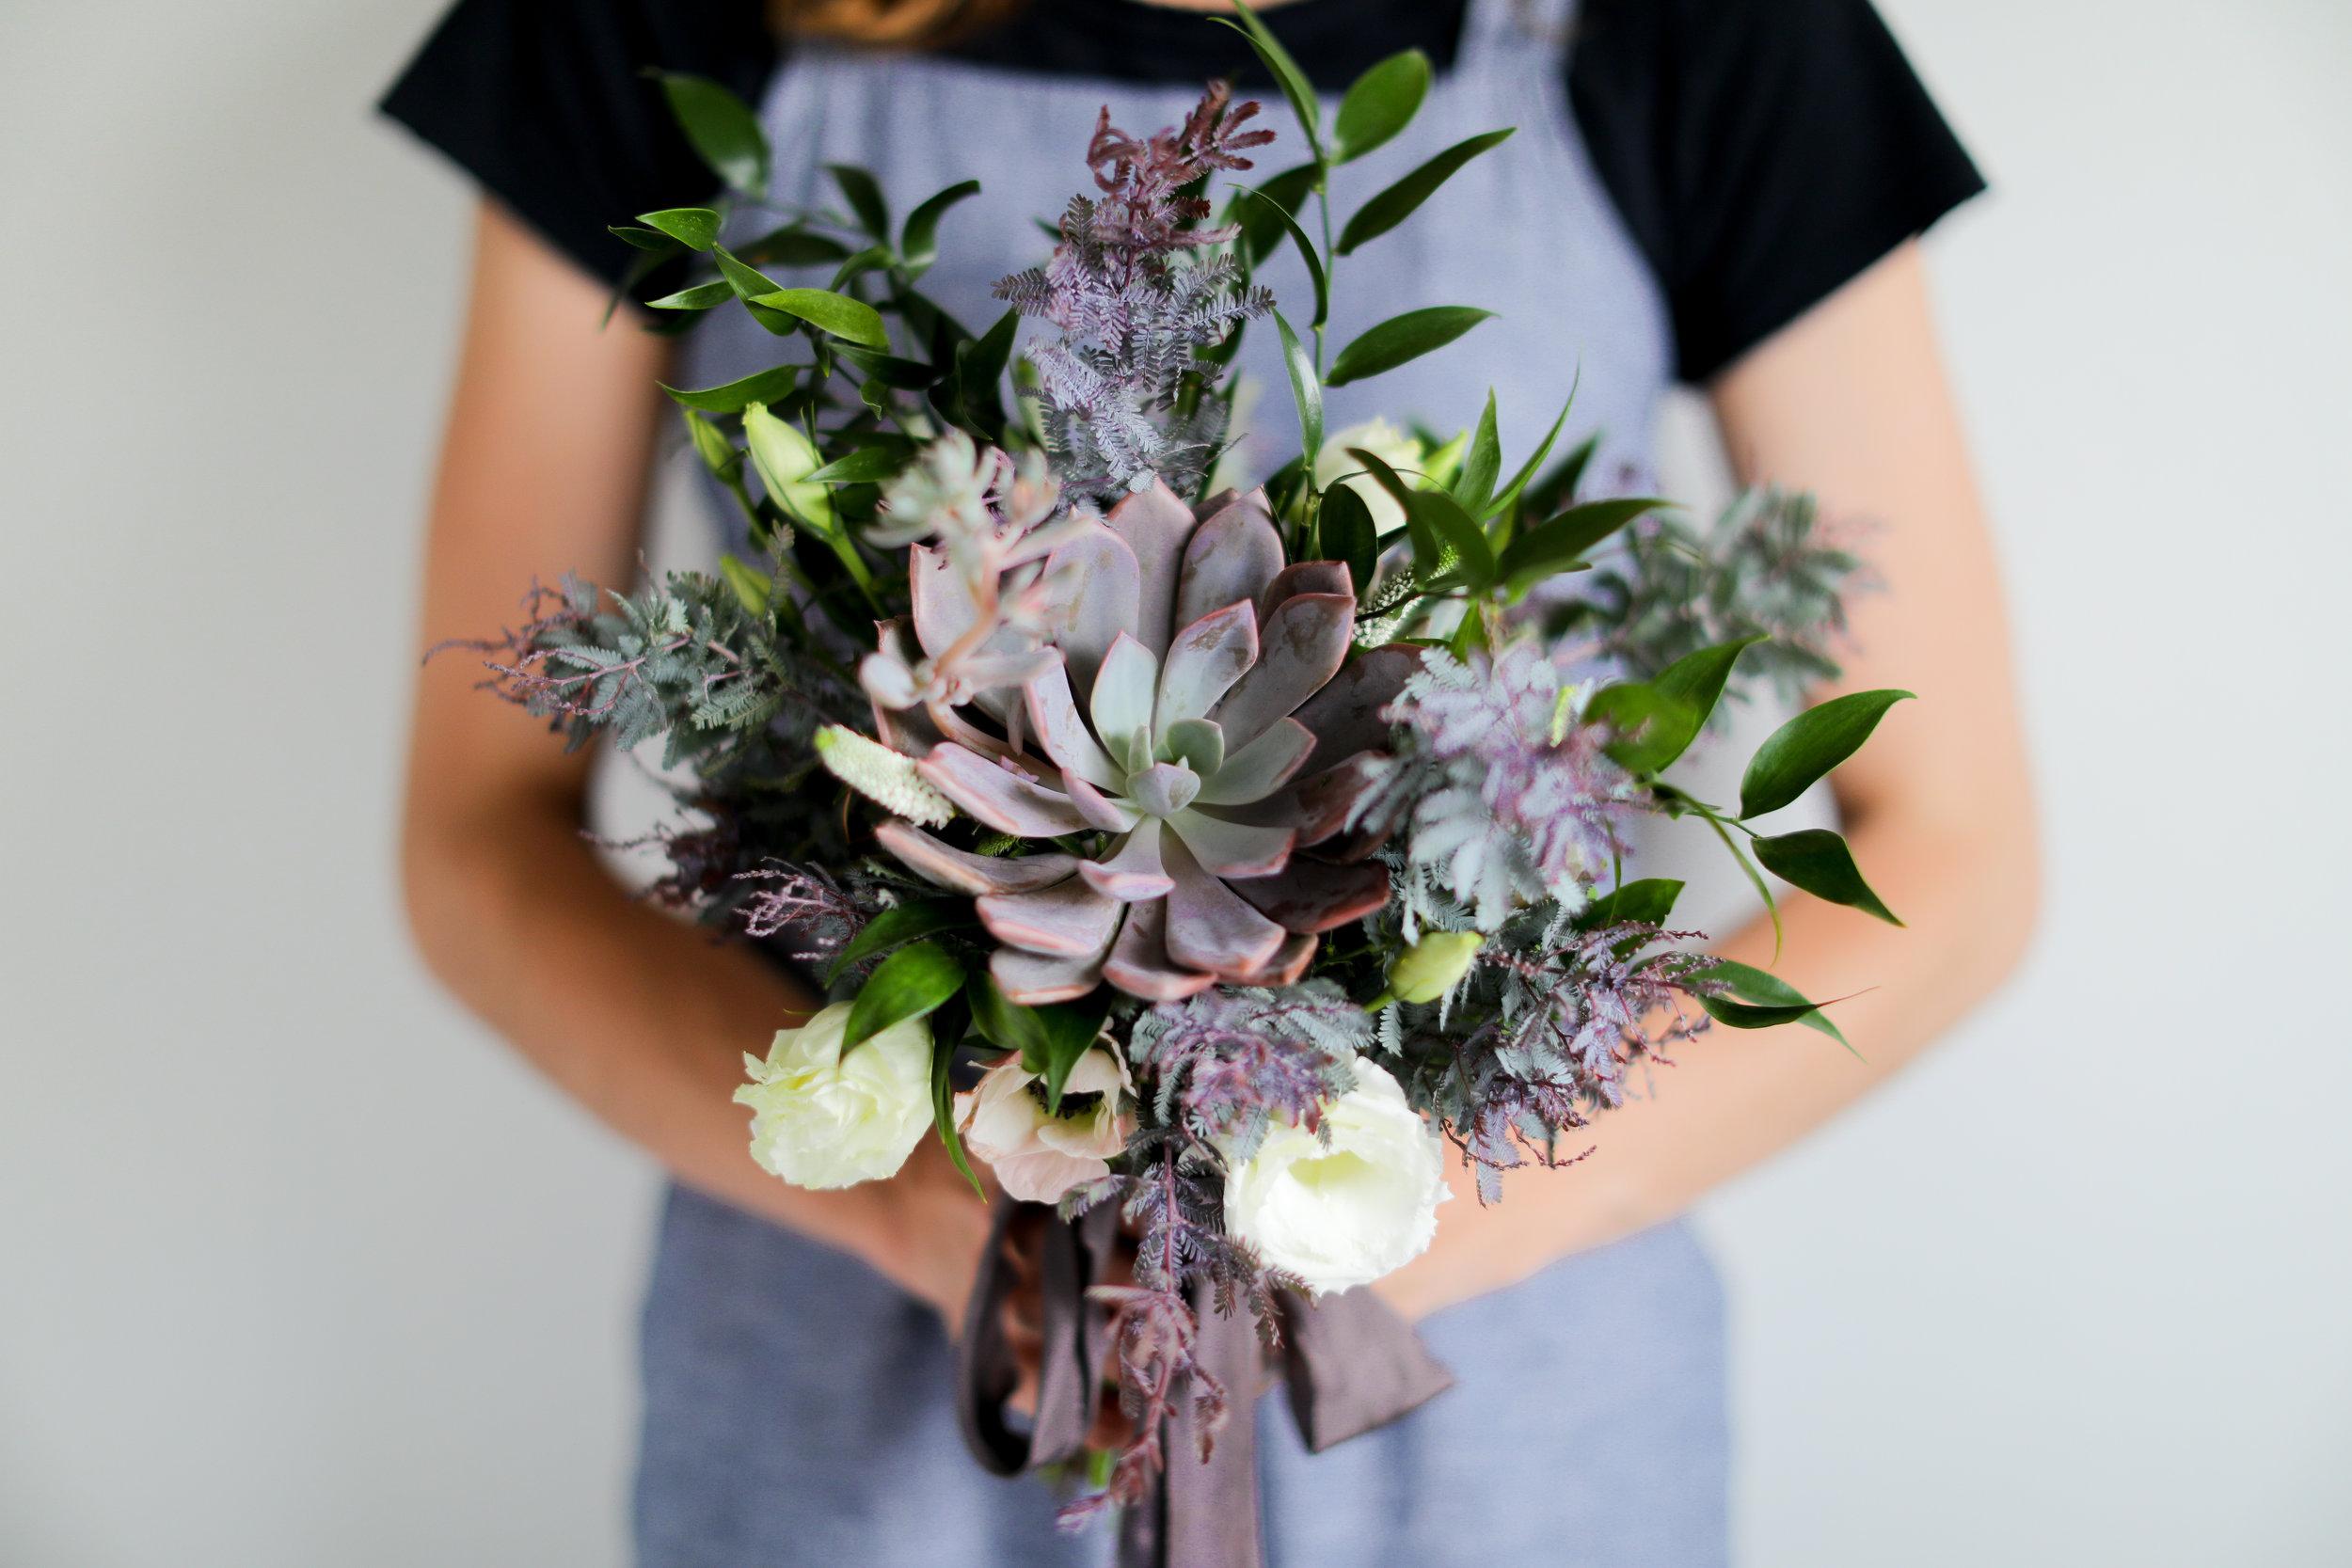 SibylSophia_Bouquet_Greenery_Texture_Succulent.jpg